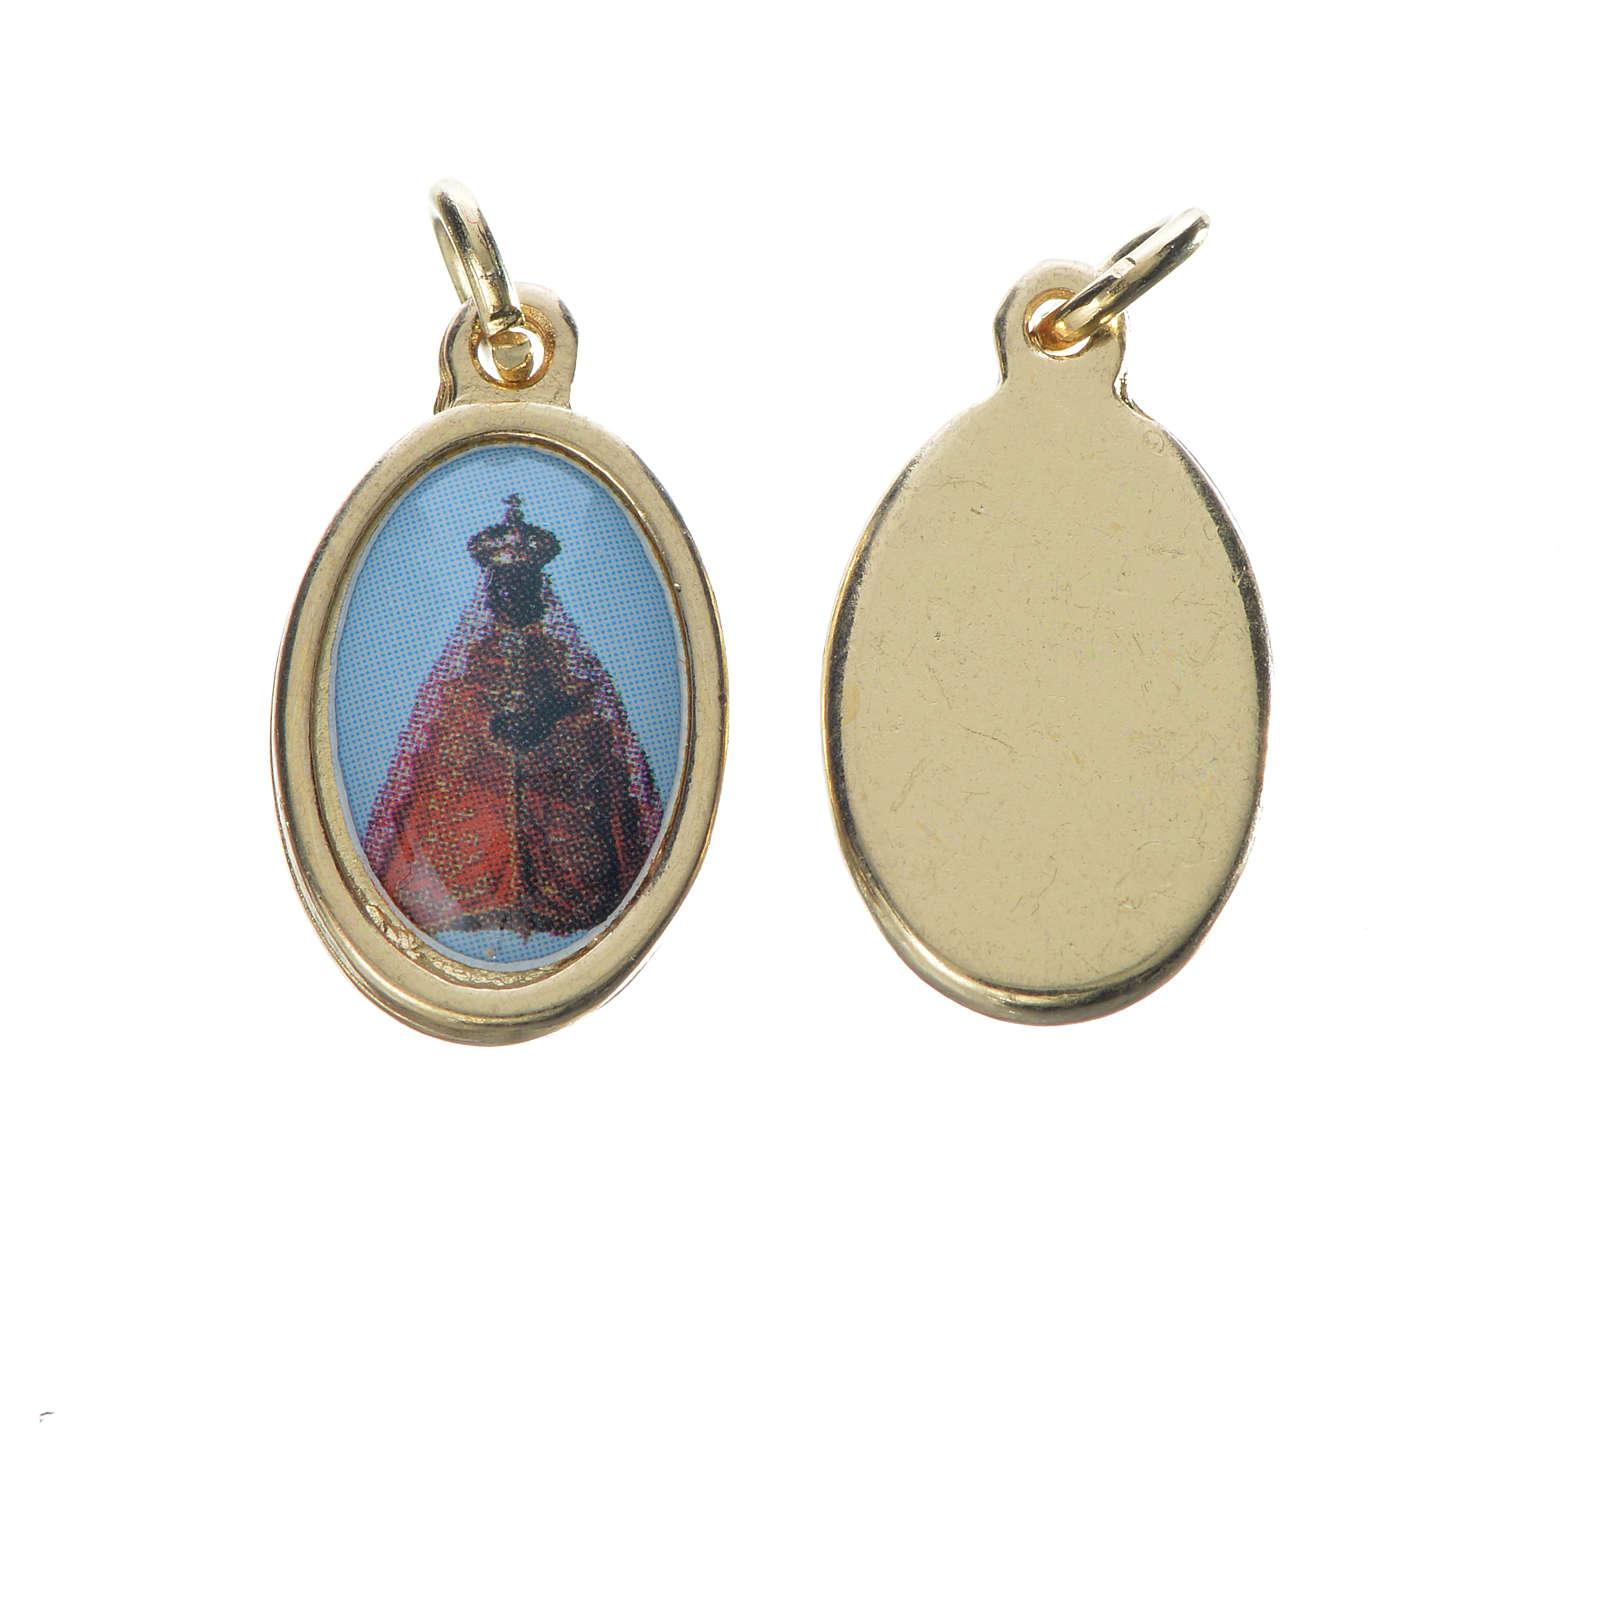 Medaglia Vergine Nera metallo dorato 1,5cm 4